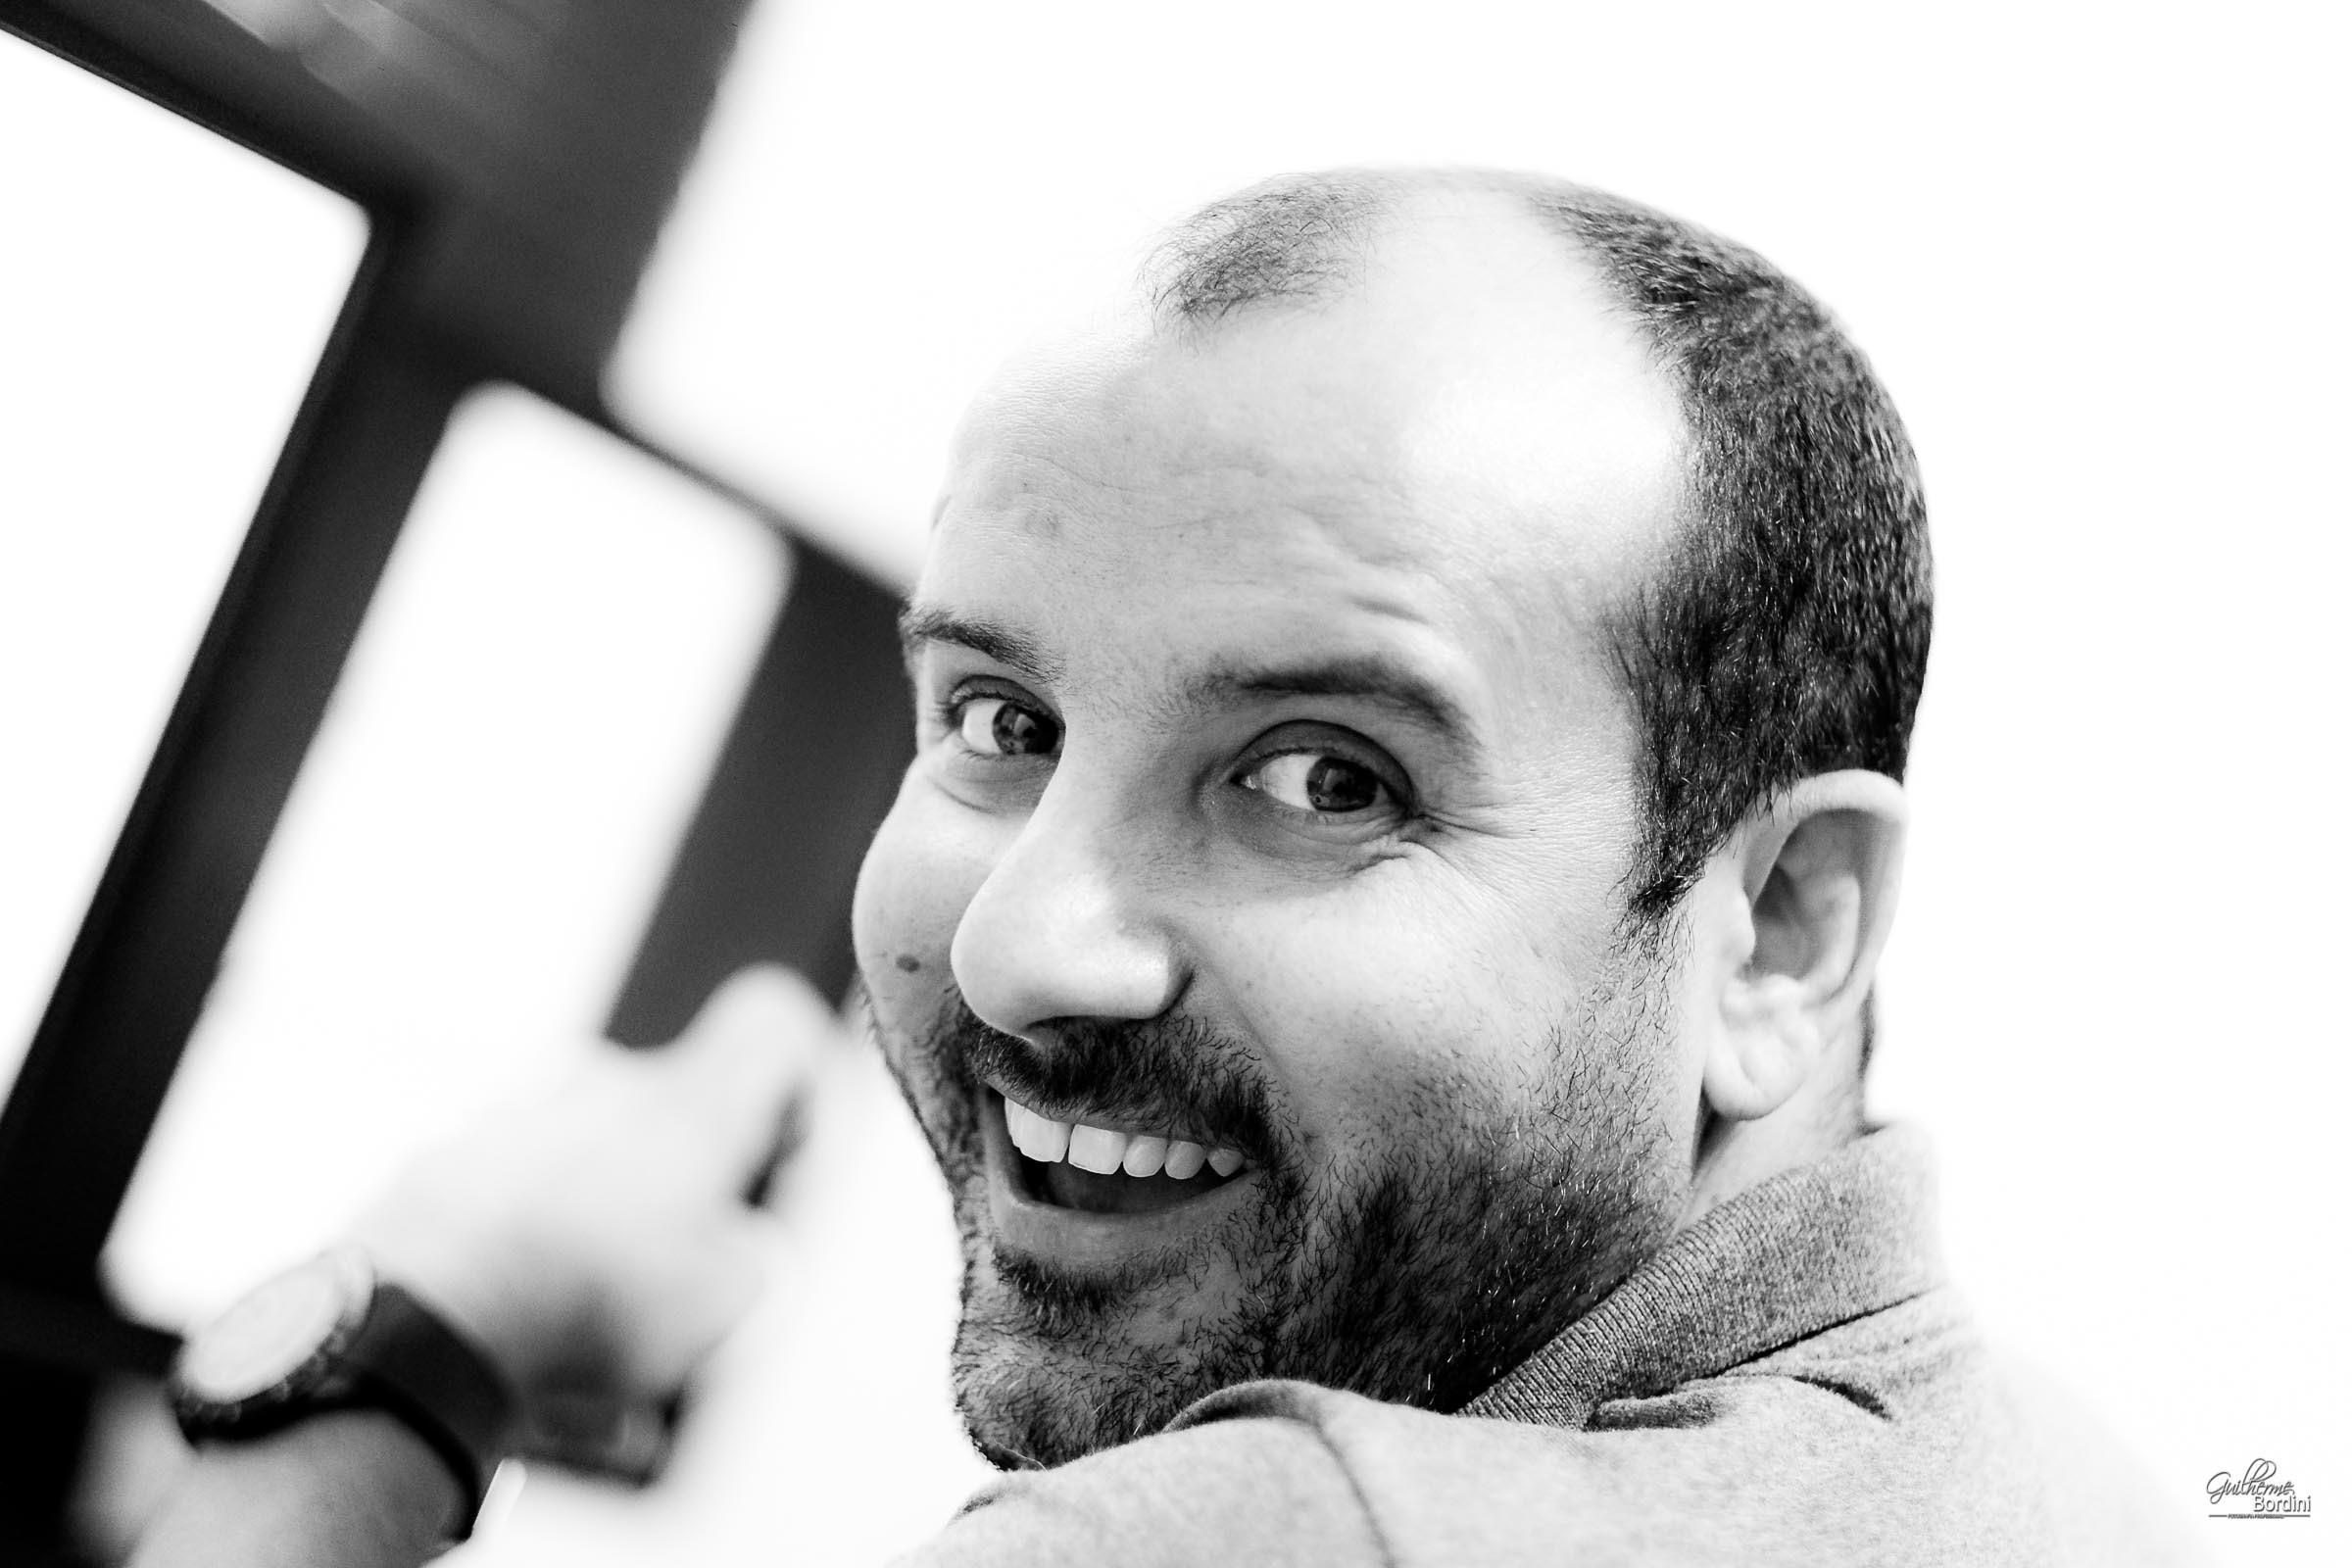 Sobre Guilherme Bordini Fotografias